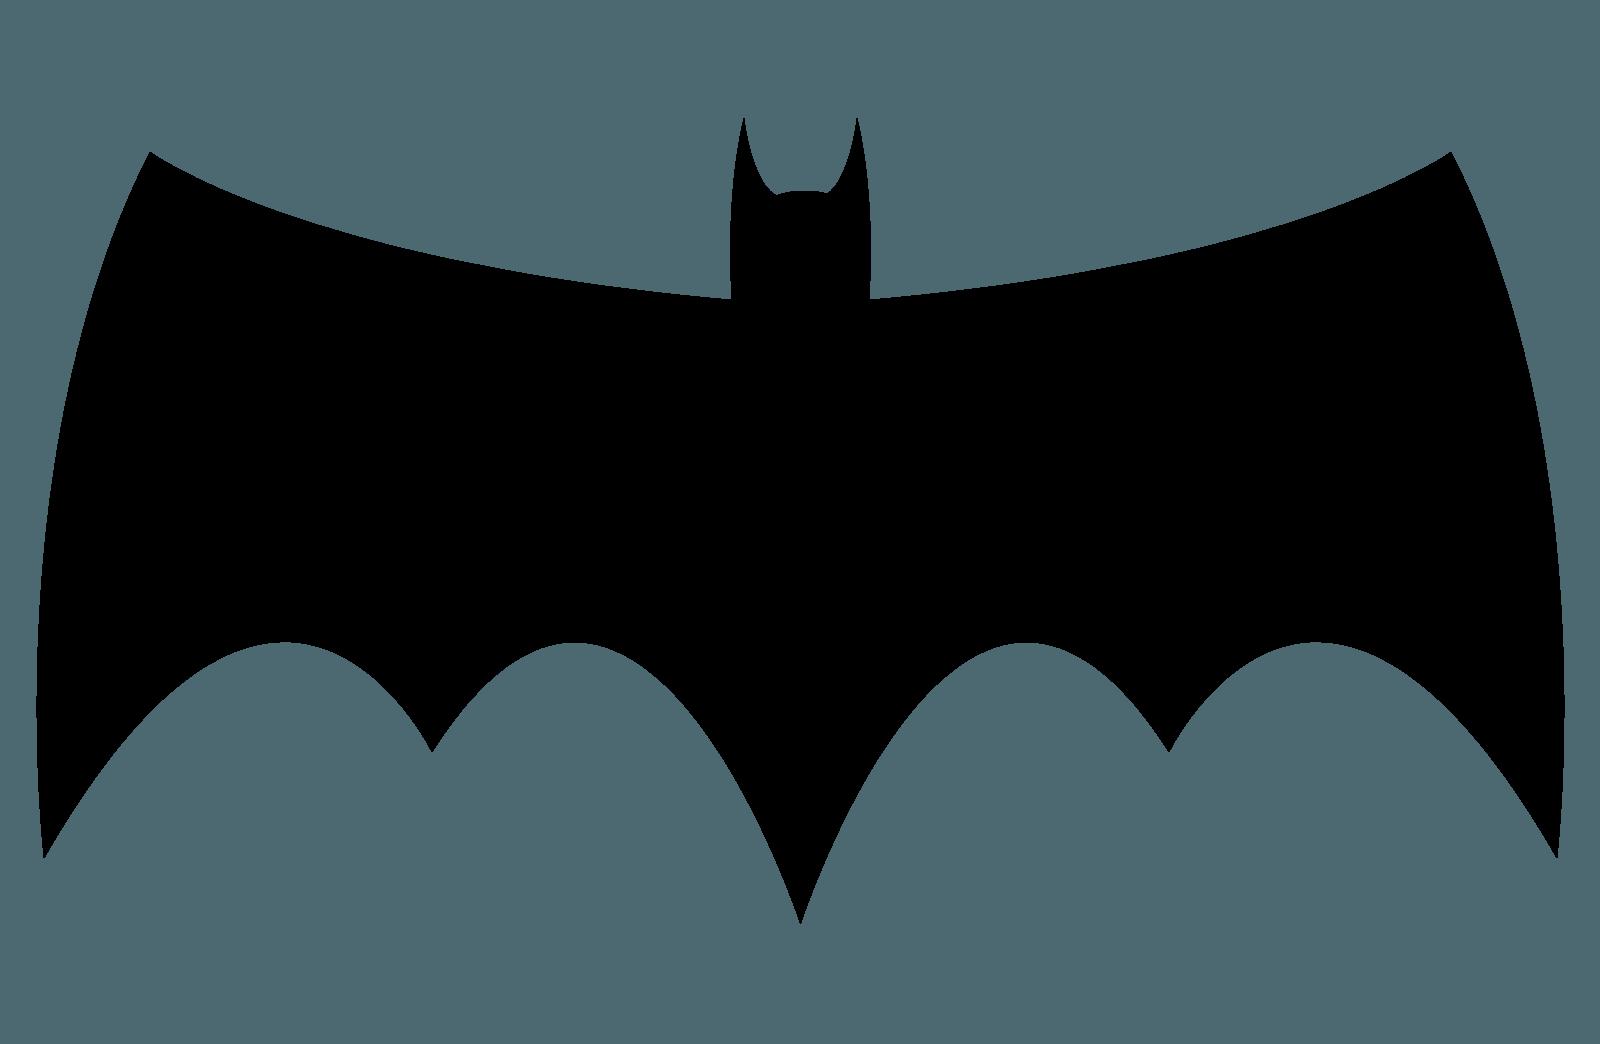 Batman Beyond Logo By Machsabre On Clipart Library